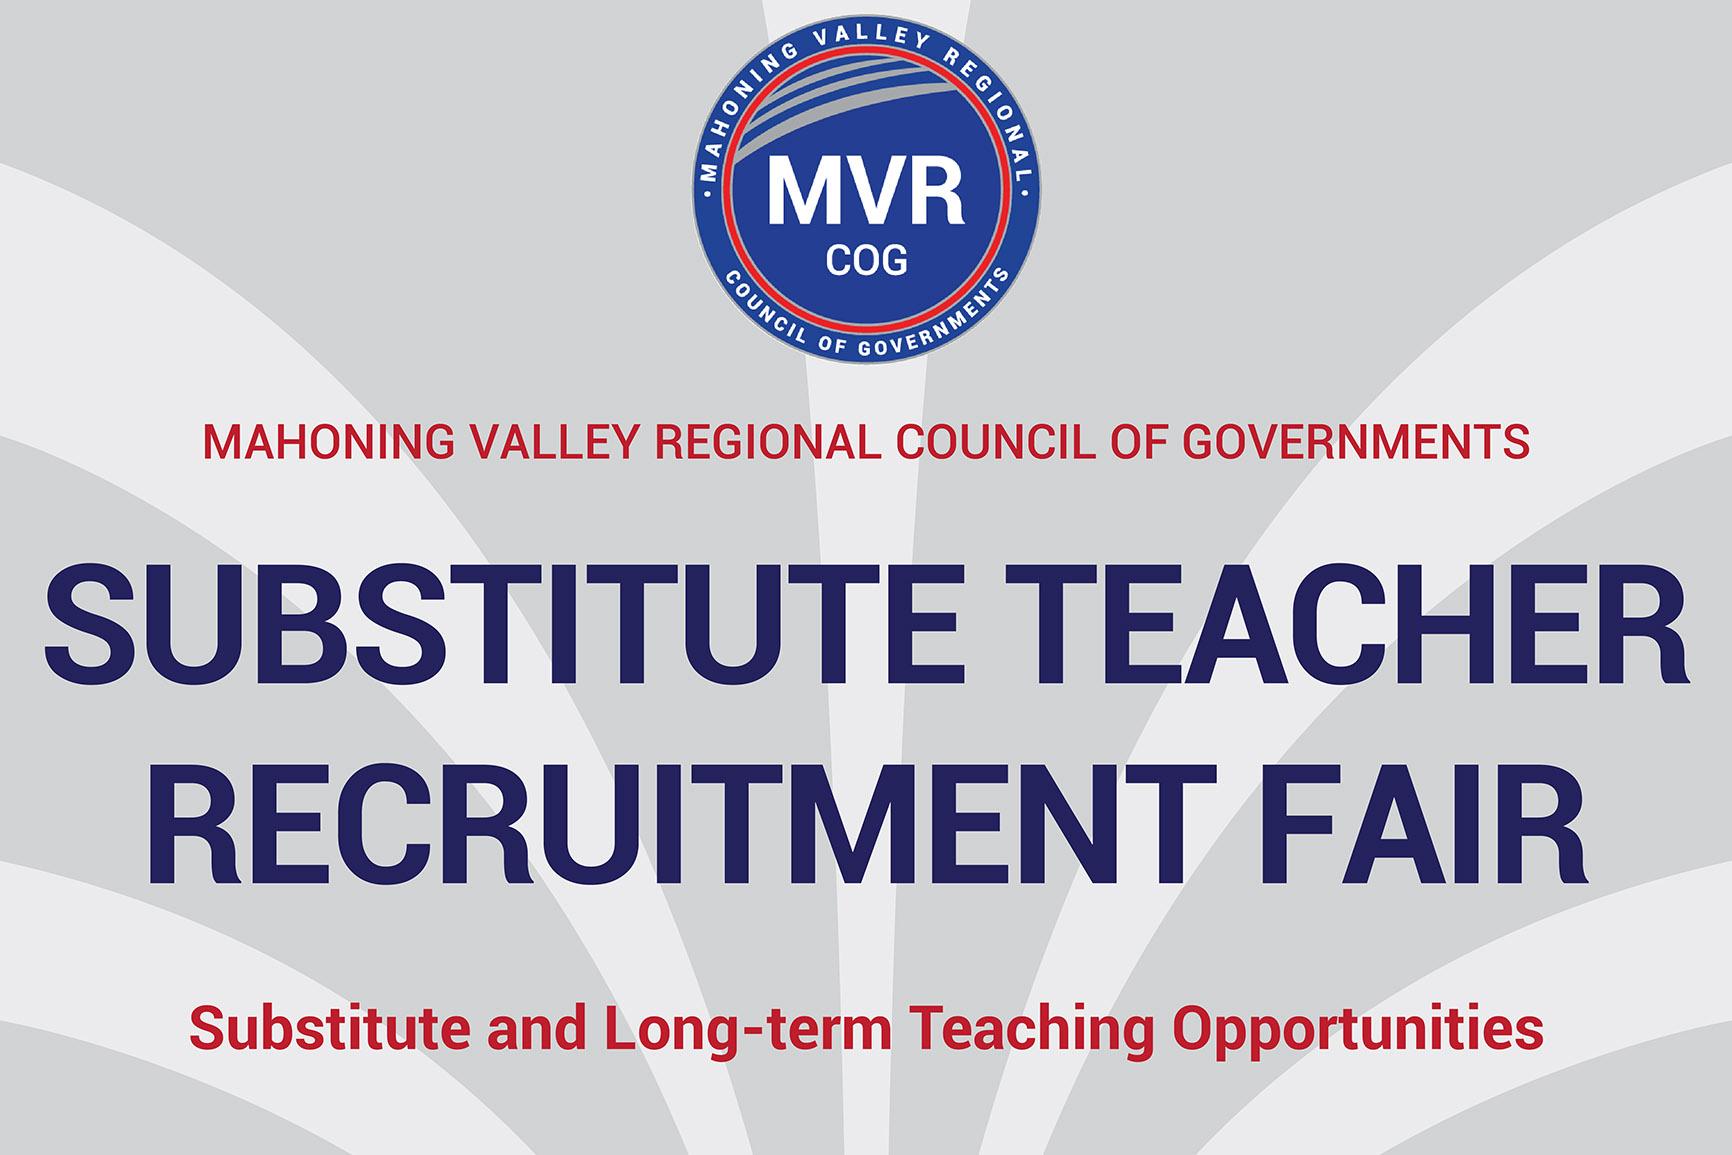 Substitute Teacher Recruitment Fair